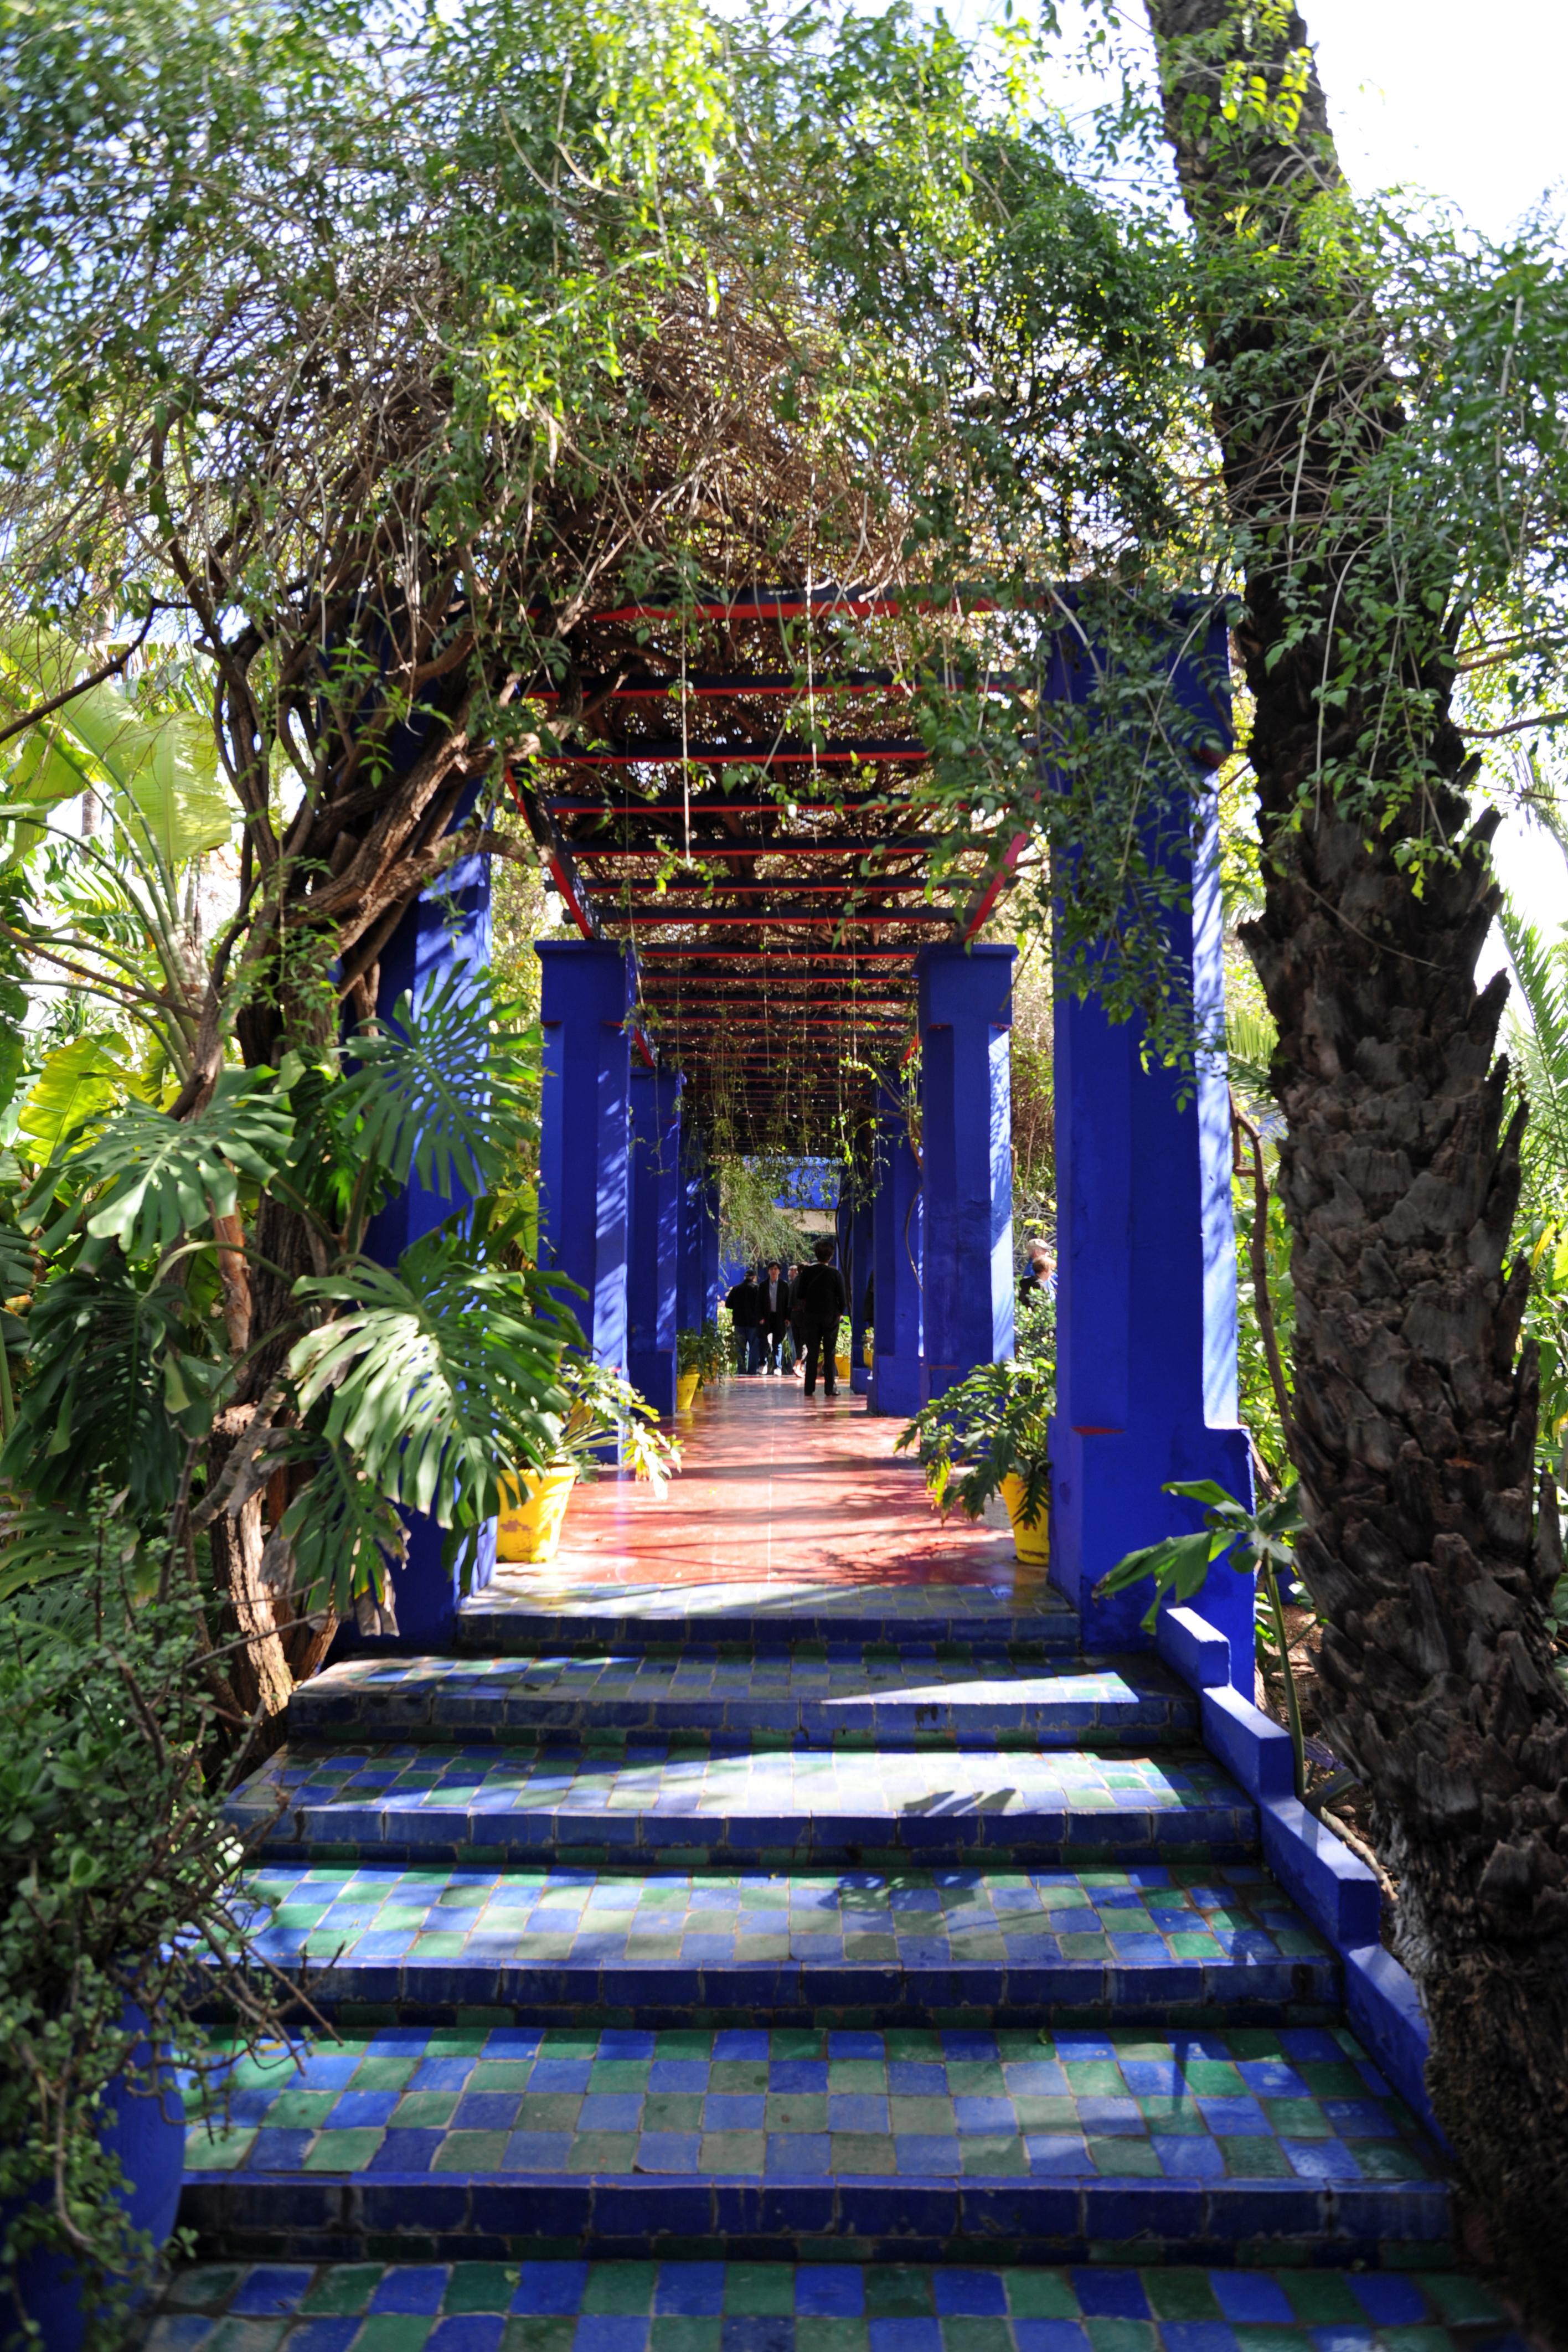 Le jardin majorelle marrakech au maroc for Jardin majorelle